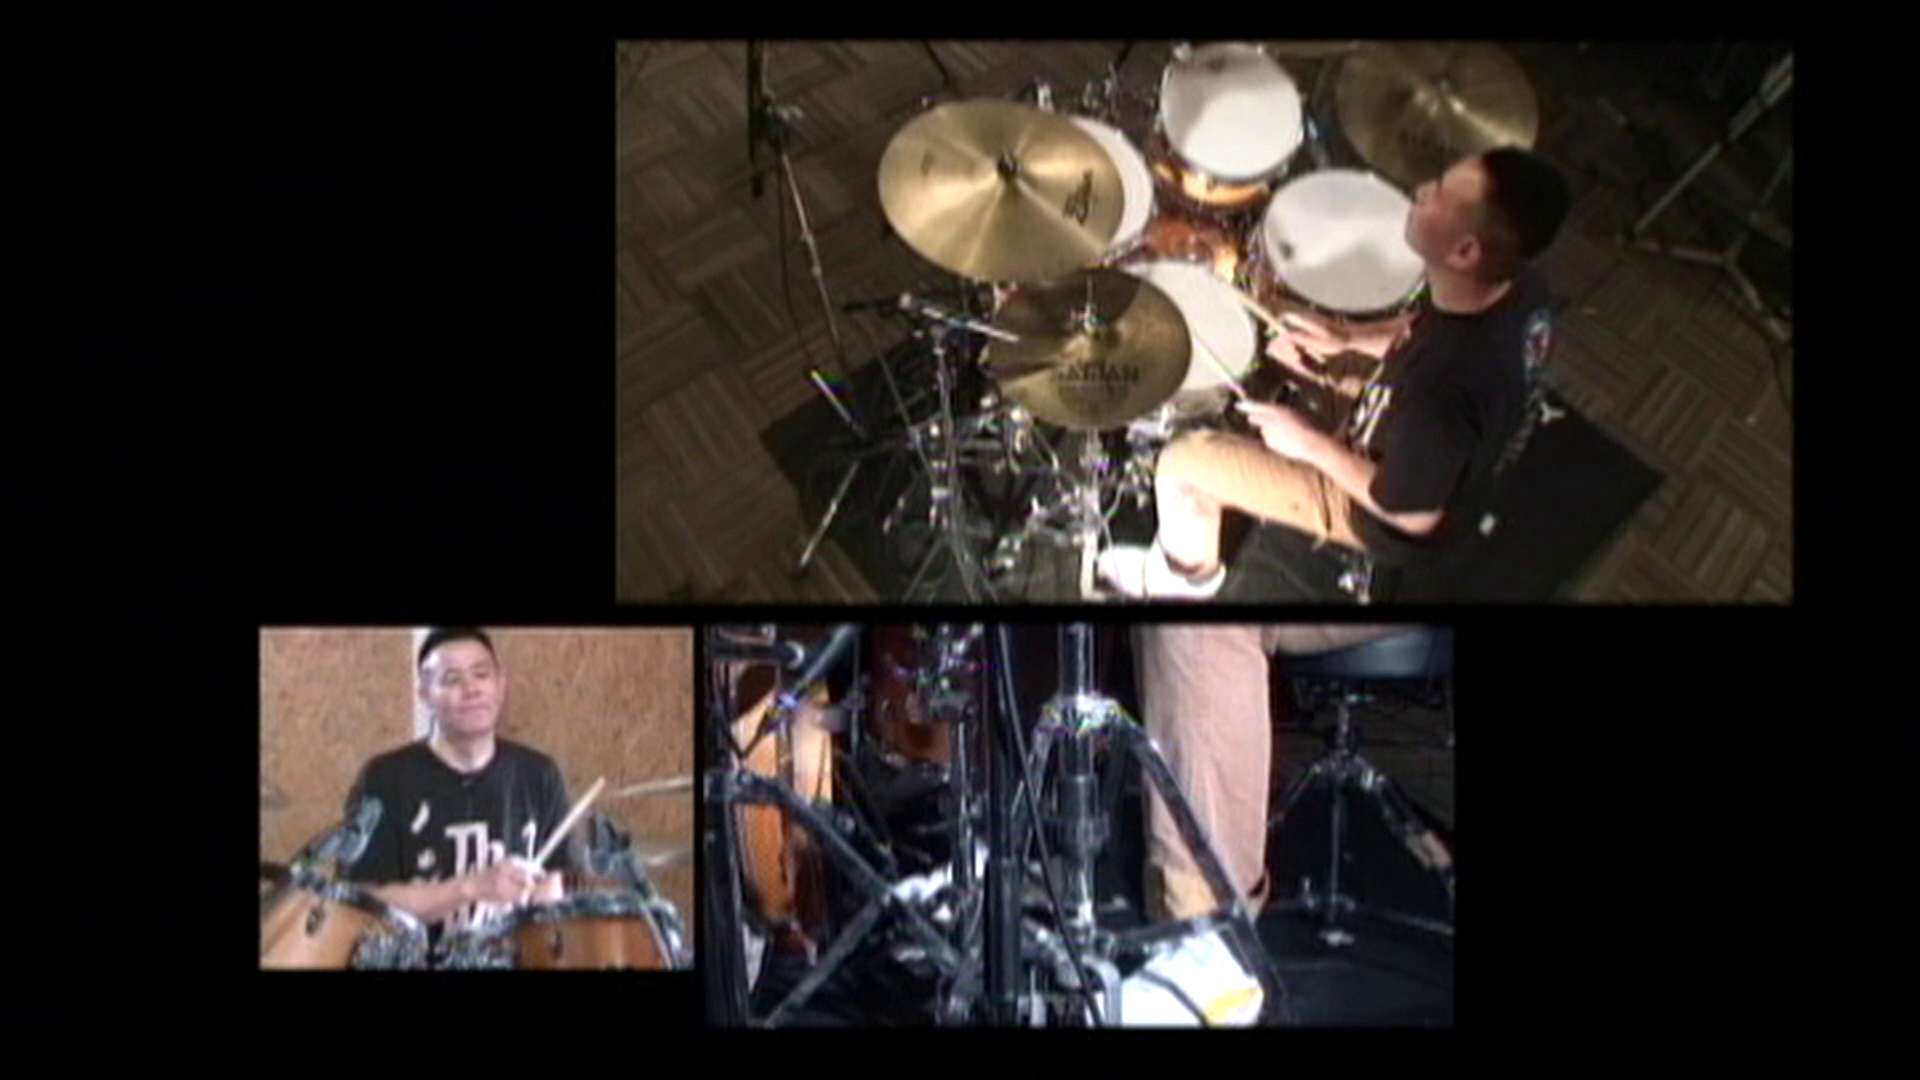 THE BLUE HEARTSの曲で学ぶ 情熱ベーシック・ドラム/梶原徹也